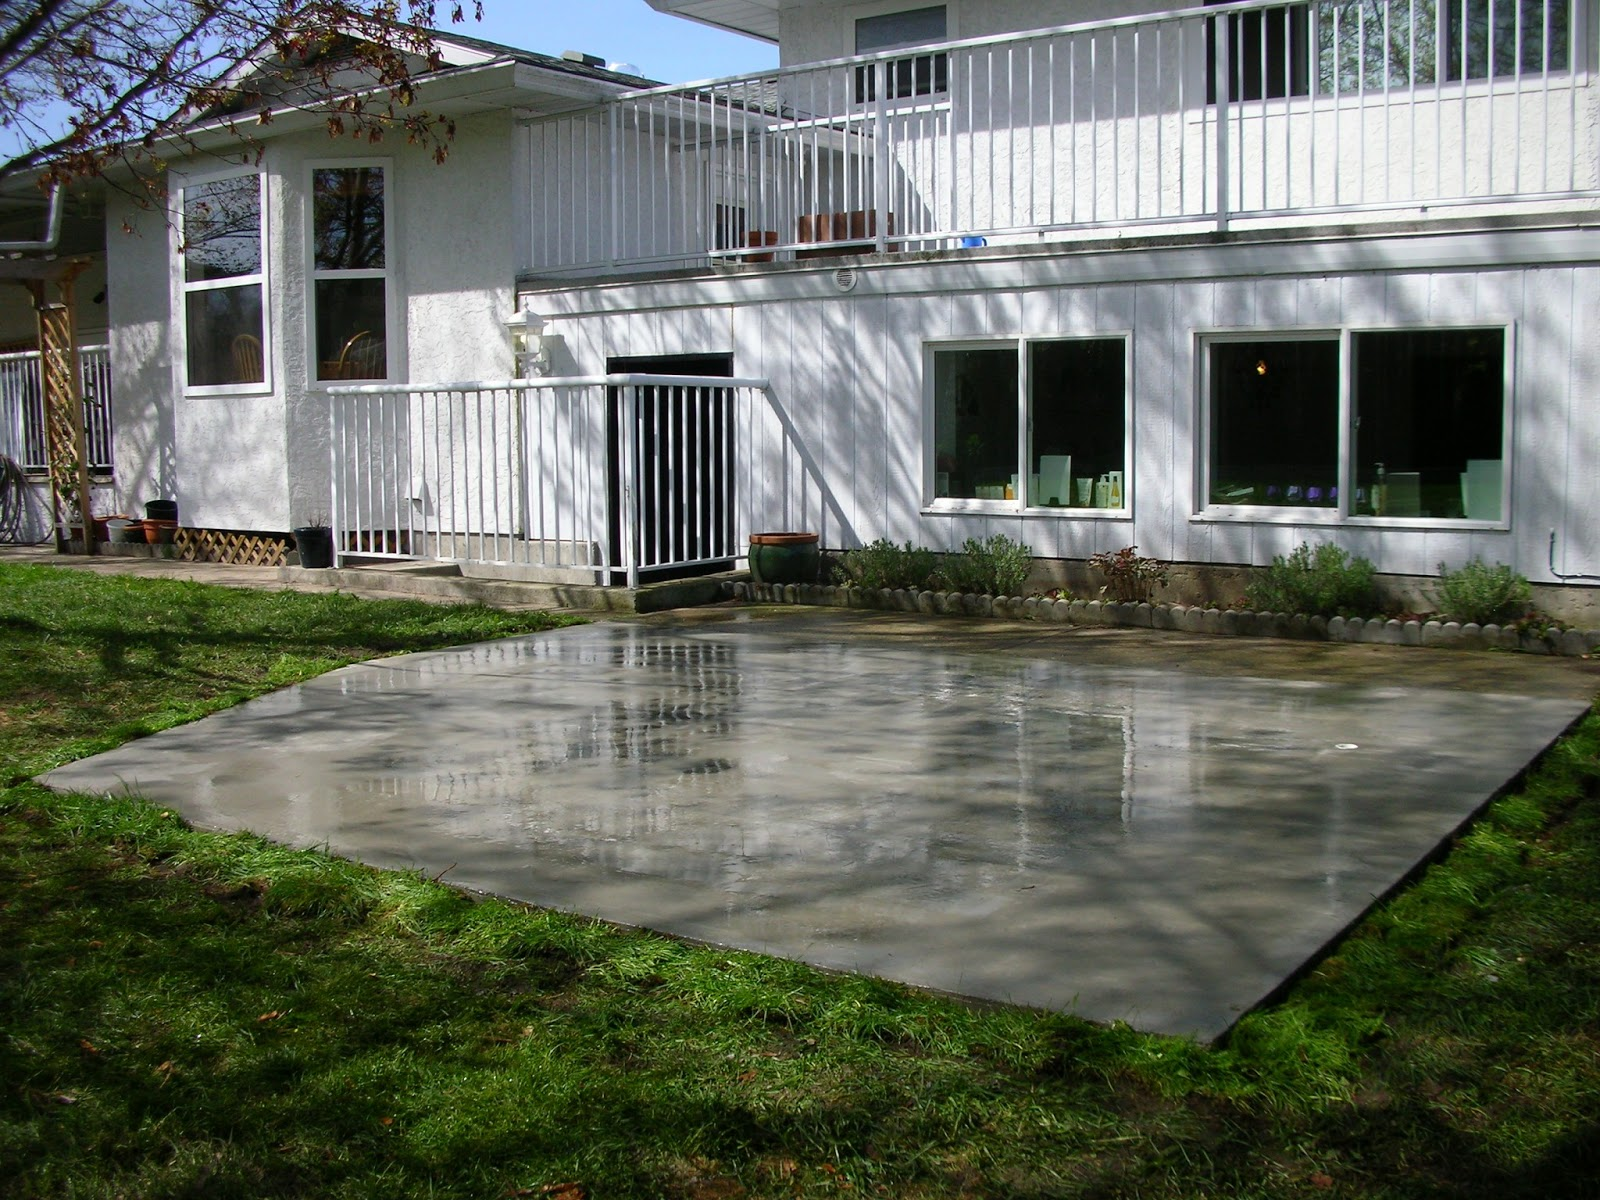 MODE CONCRETE: Concrete Patios, Concrete Slabs, Driveways ... on Concrete Slab Backyard Ideas id=57947